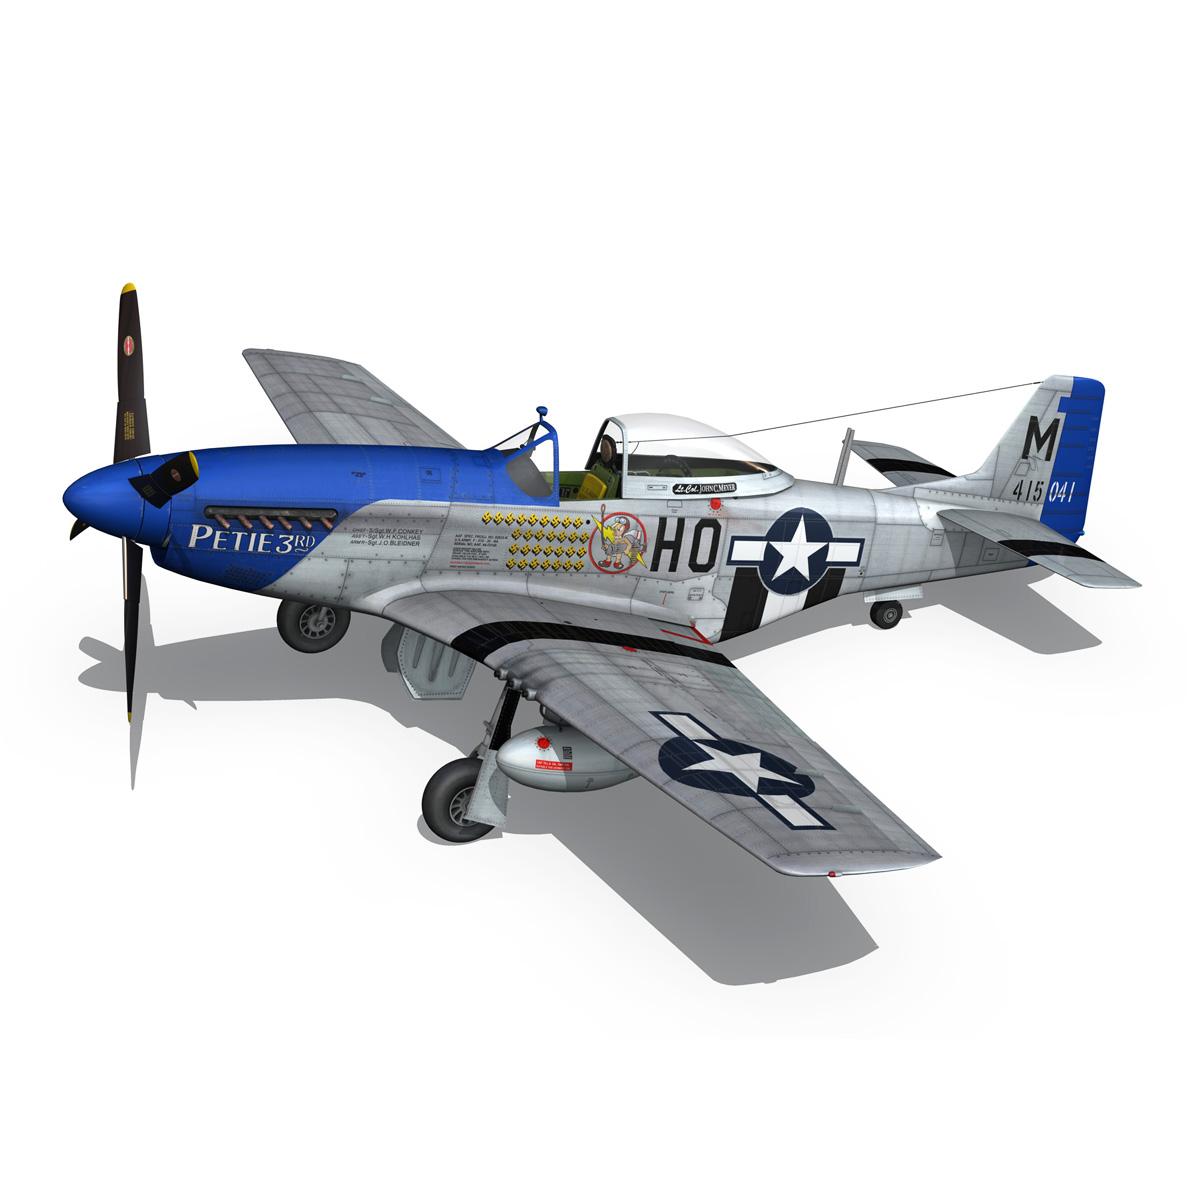 north american p-51d mustang – petie 3rd 3d model fbx c4d lwo obj 280138